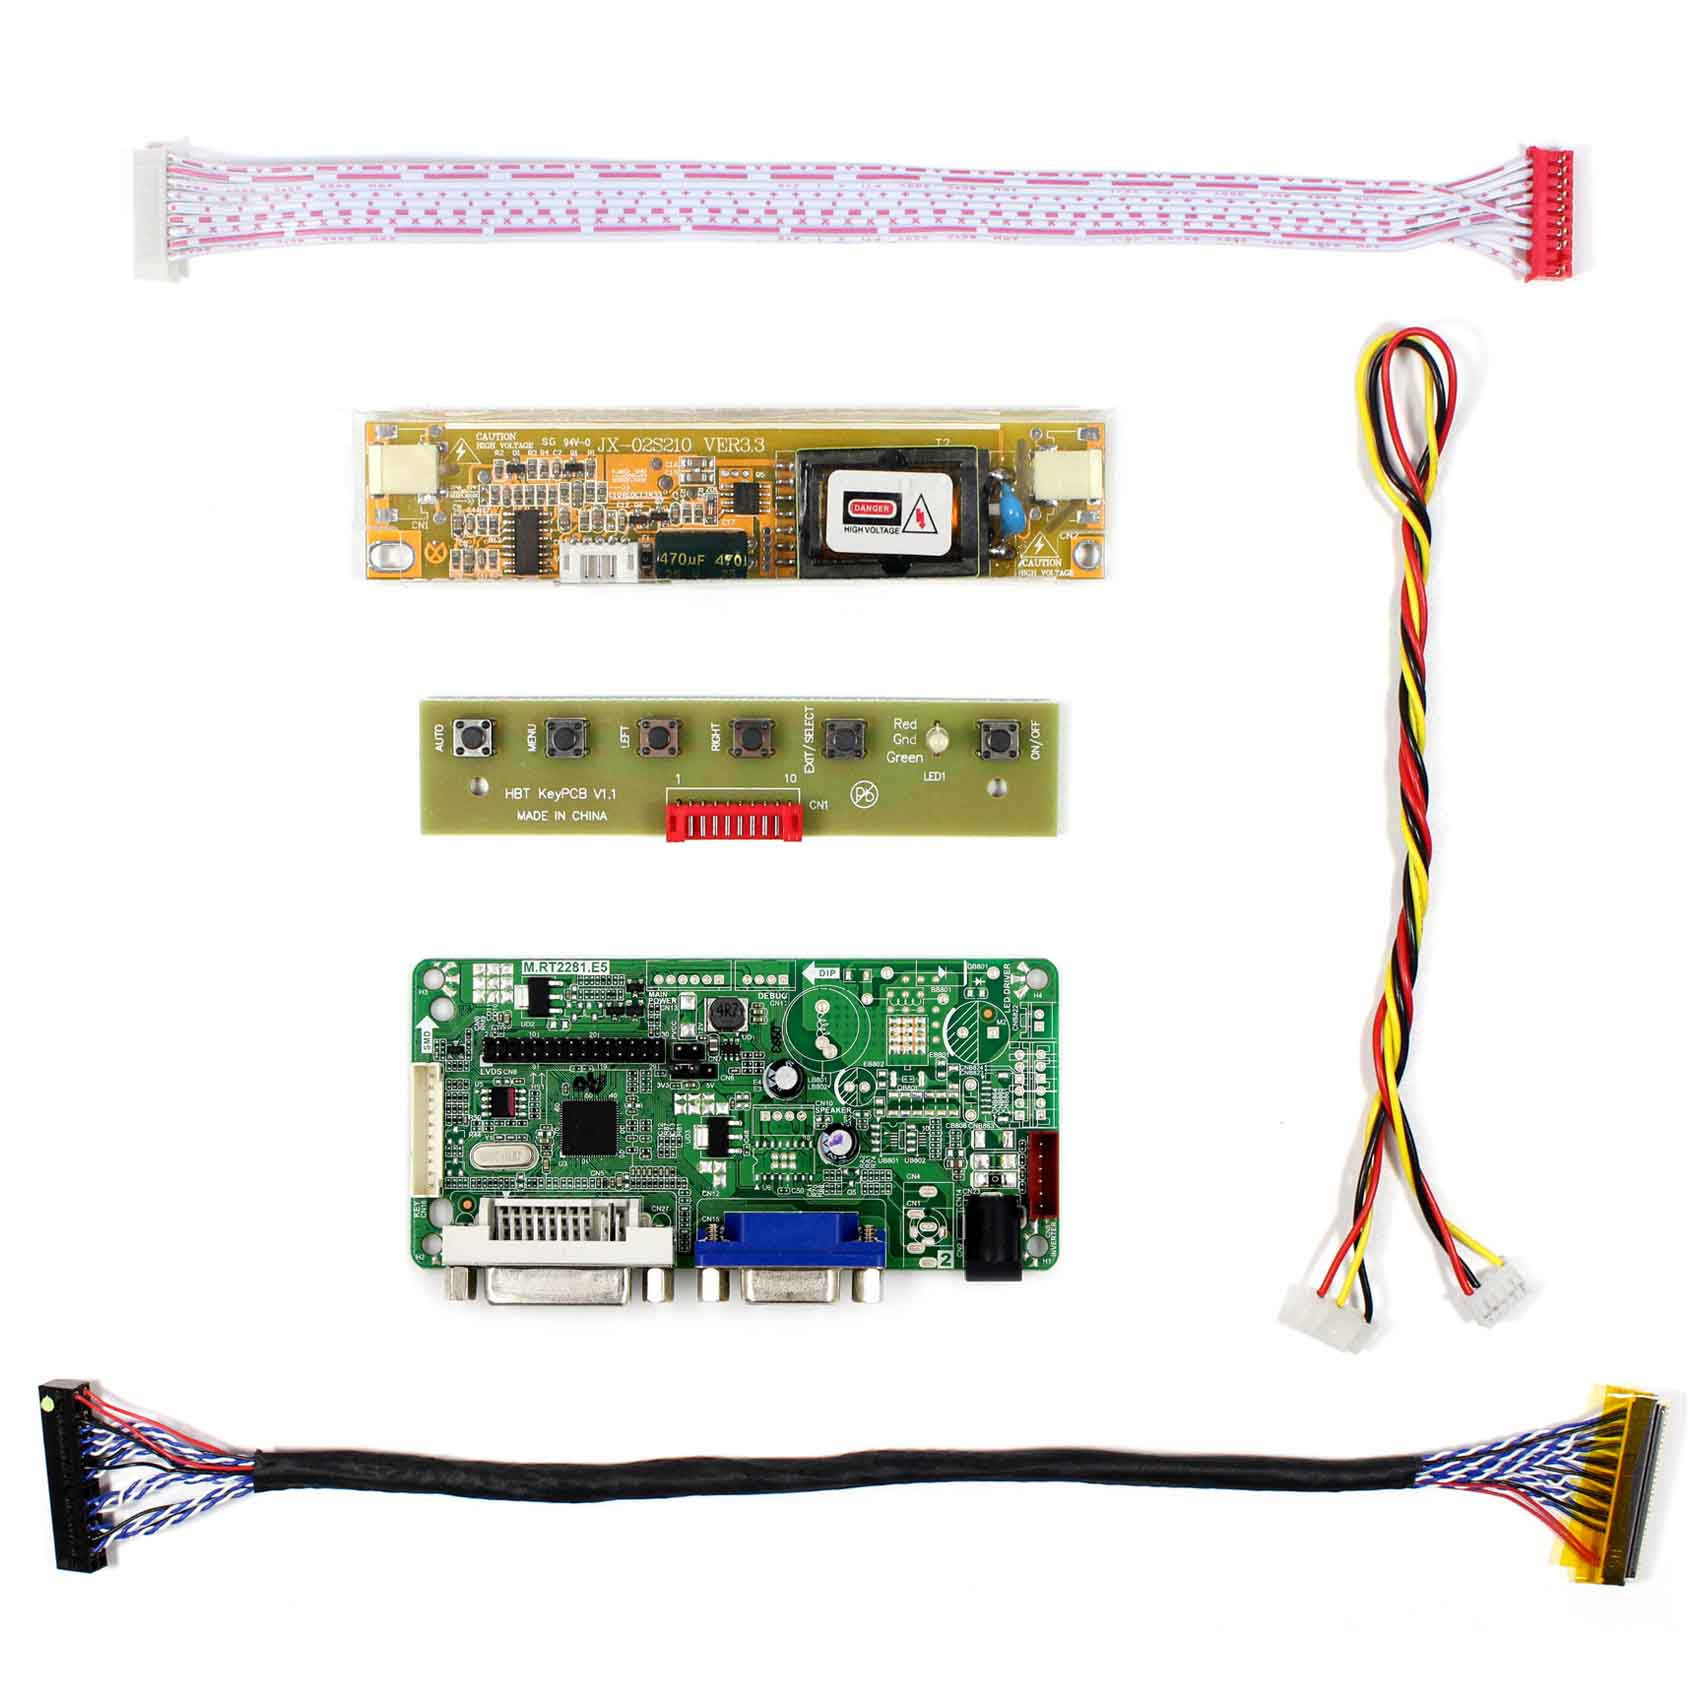 DVI VGA LCD Controller Board For 17.1inch B170PW04 B170PW07  1440x900 2CCFL LCD